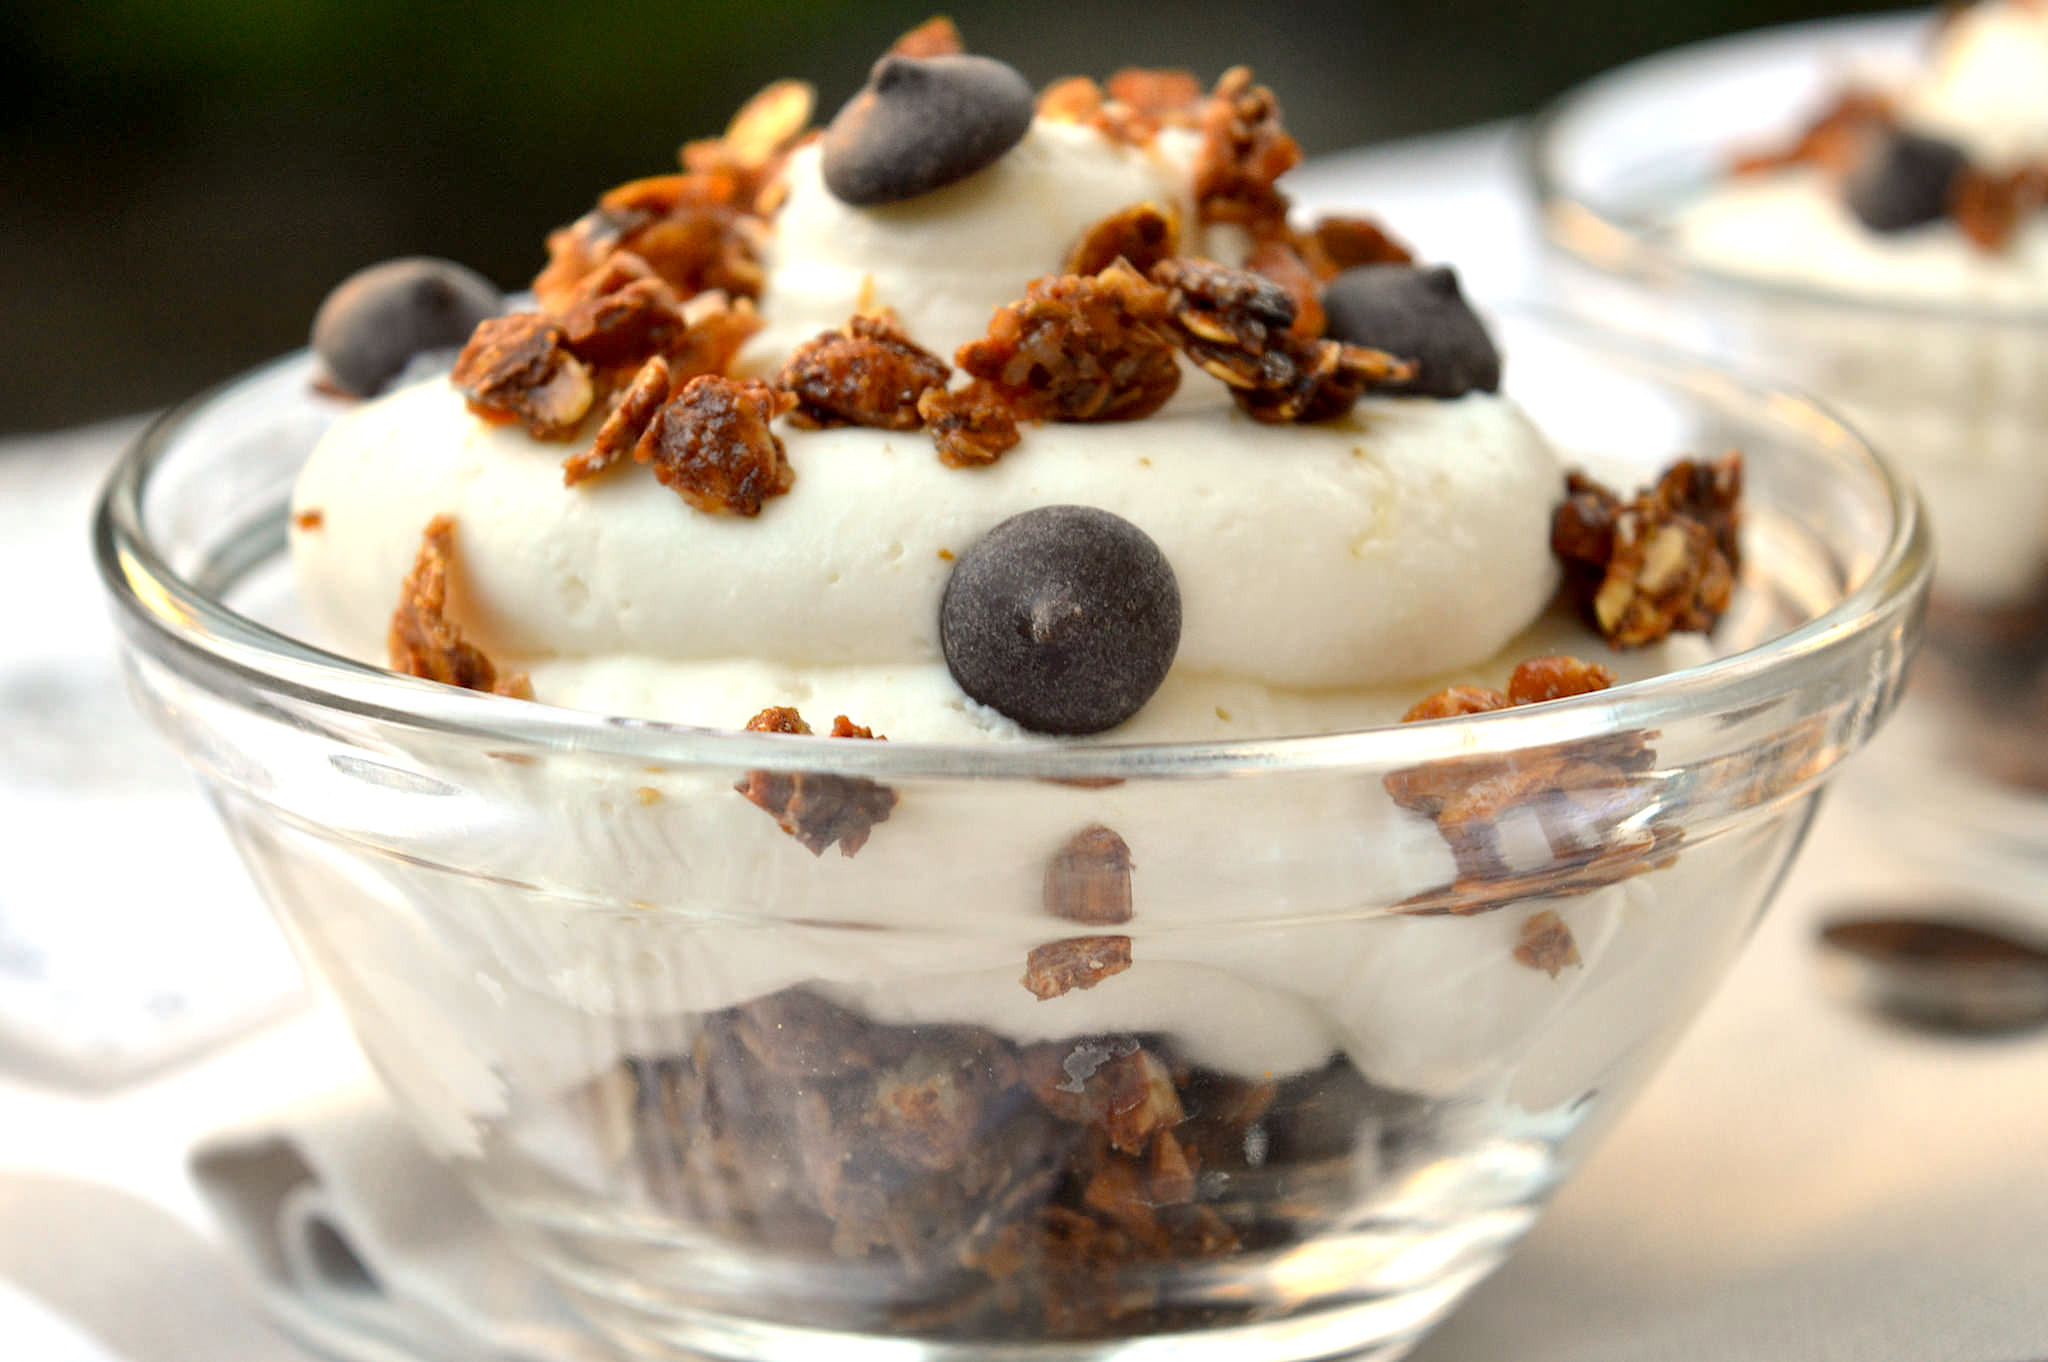 Ricetta Yogurt Bimby Tm31.Mousse Yogurt Greco Bimby Tm31 Tm5 Tm6 Dolce Al Cucchiaio